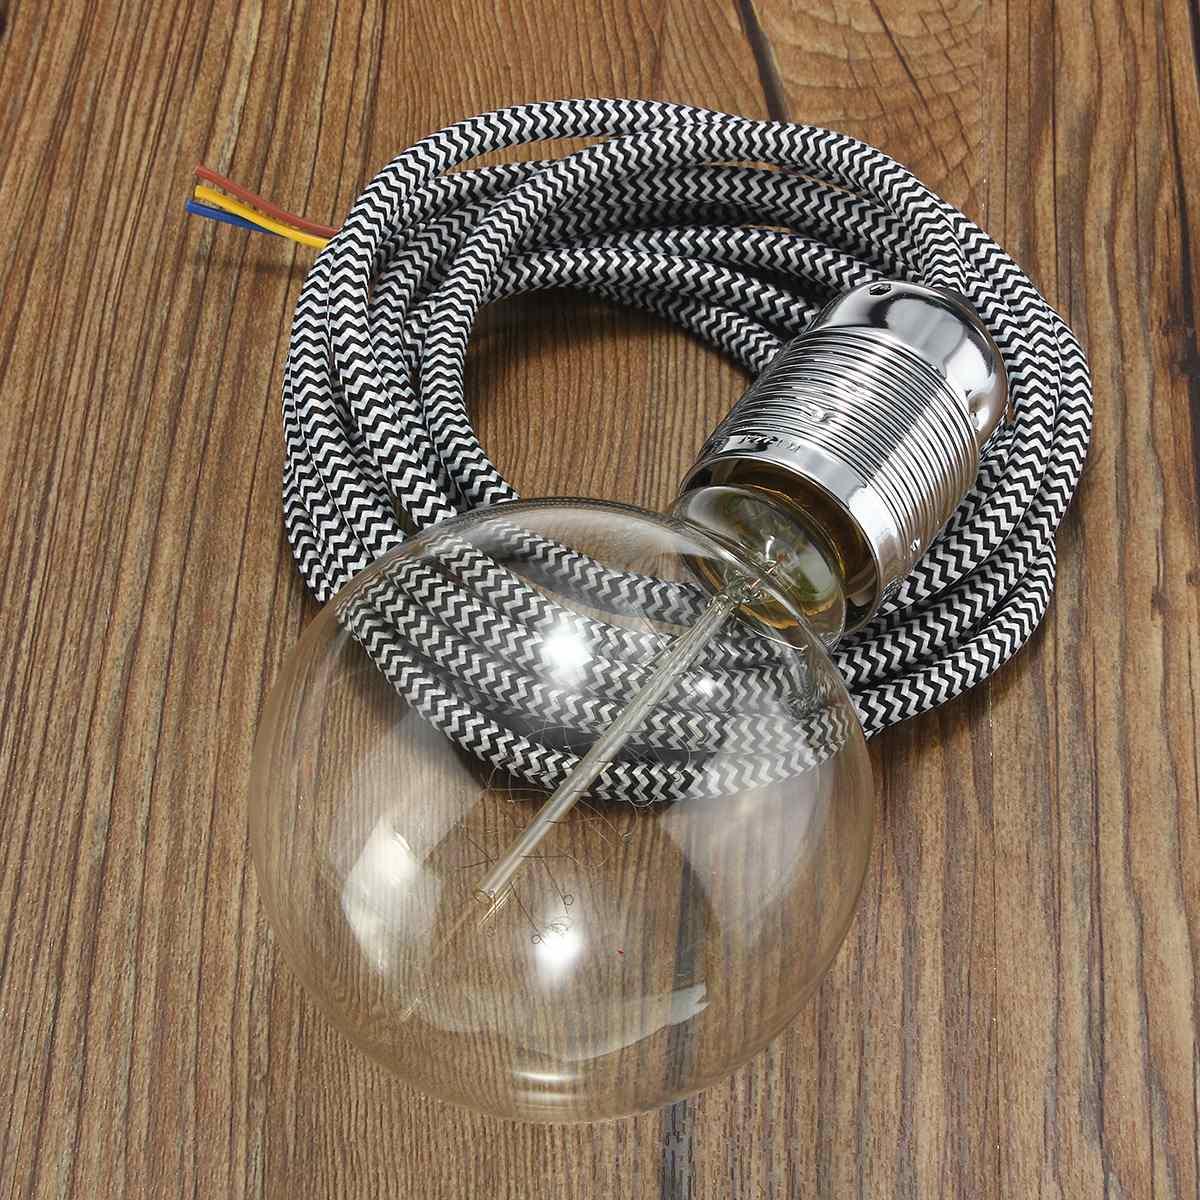 3 Meter E27 3 Core Wire Vintage Edison Lampholder Fabric Flexible Cable Pendant Lamp Light Bulb Holder Socket(China (Mainland))